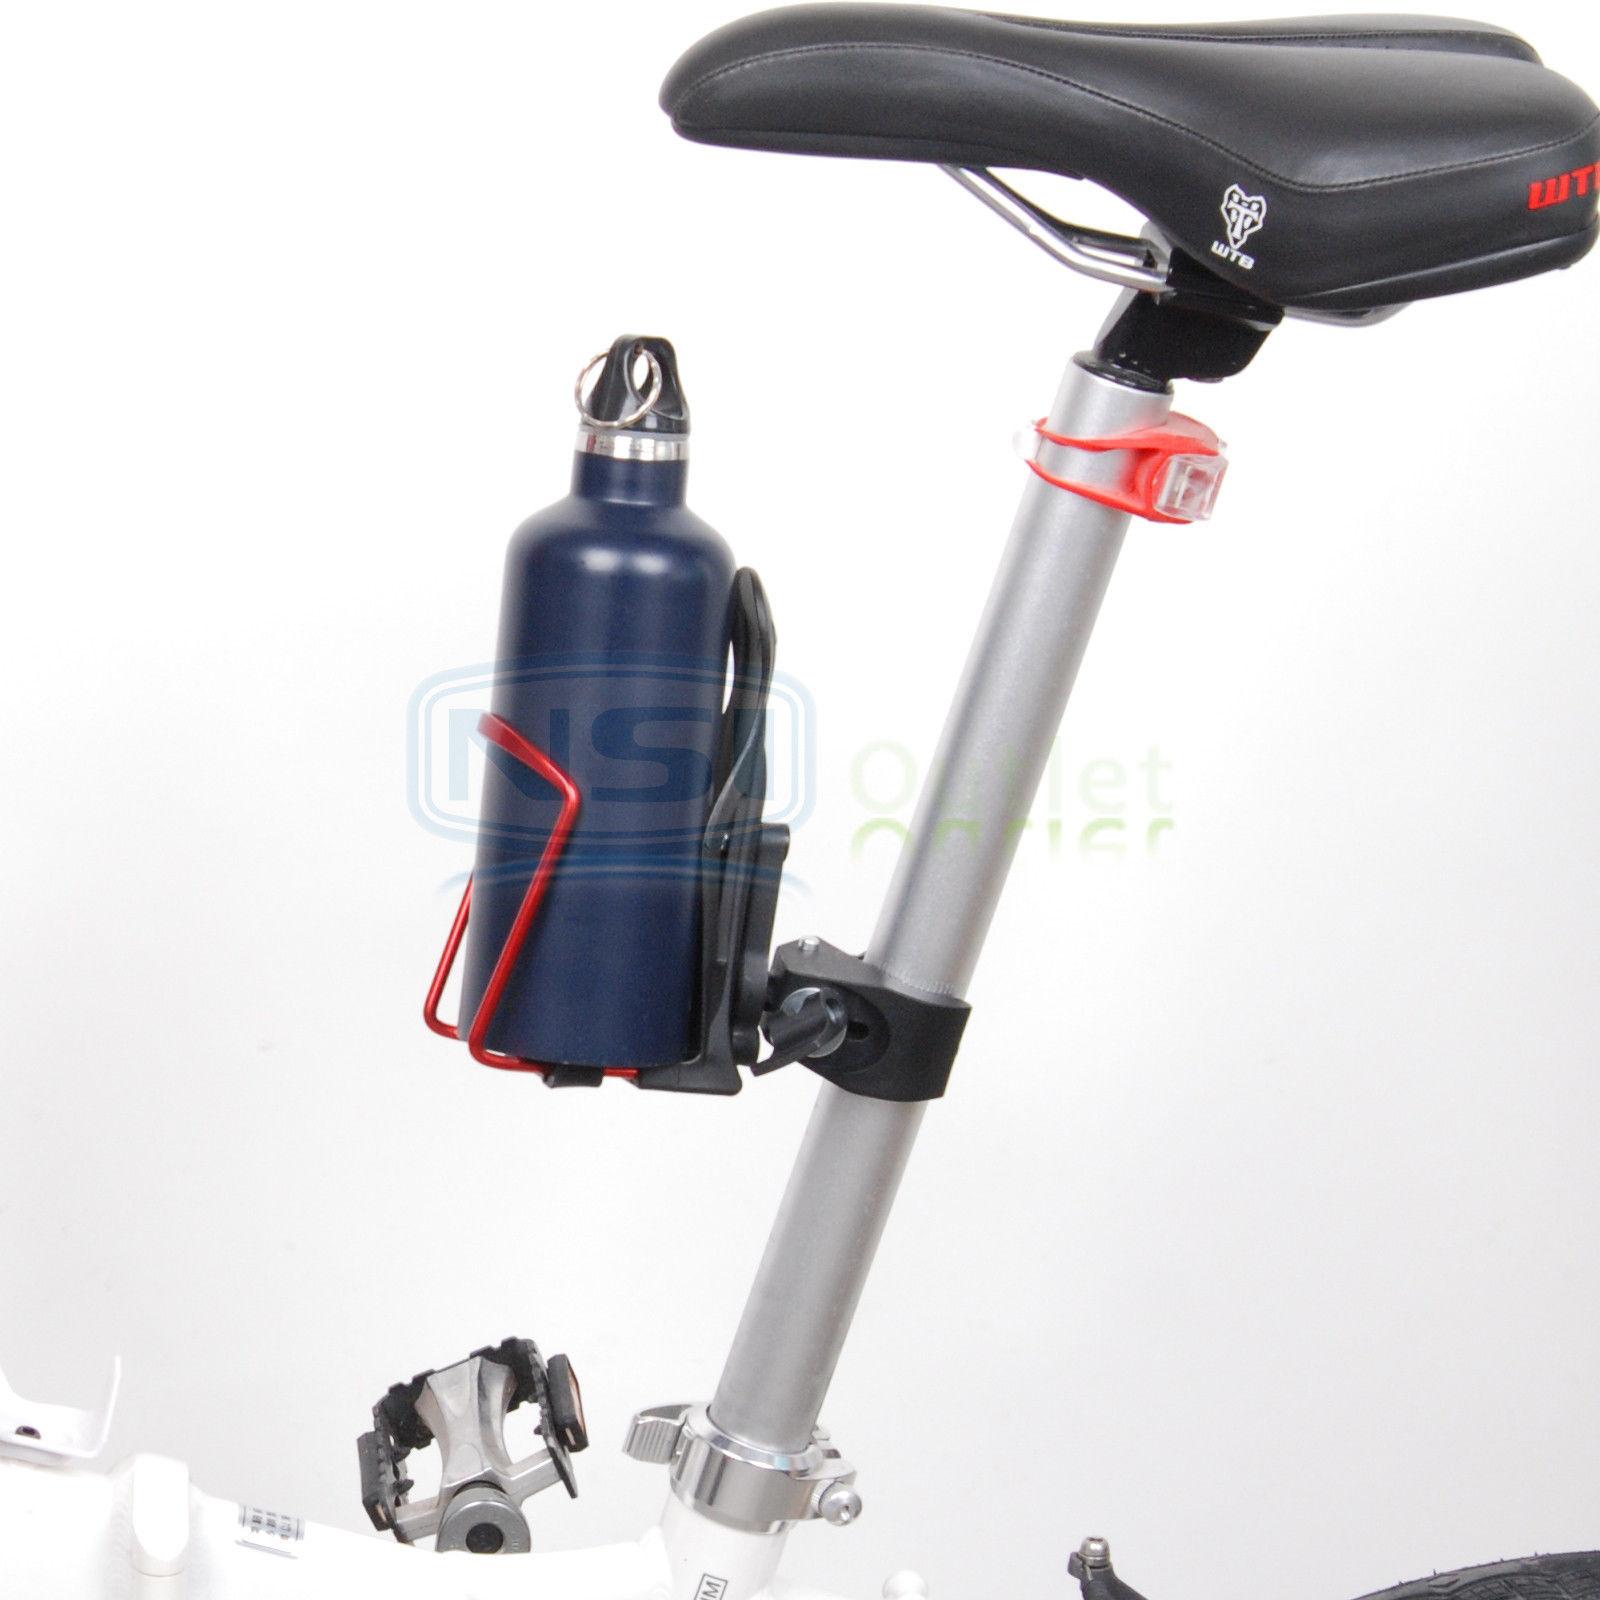 New Bicycle Bottle Holder Adjustable Mountain Bike Water Bottle Cage Drink Rack